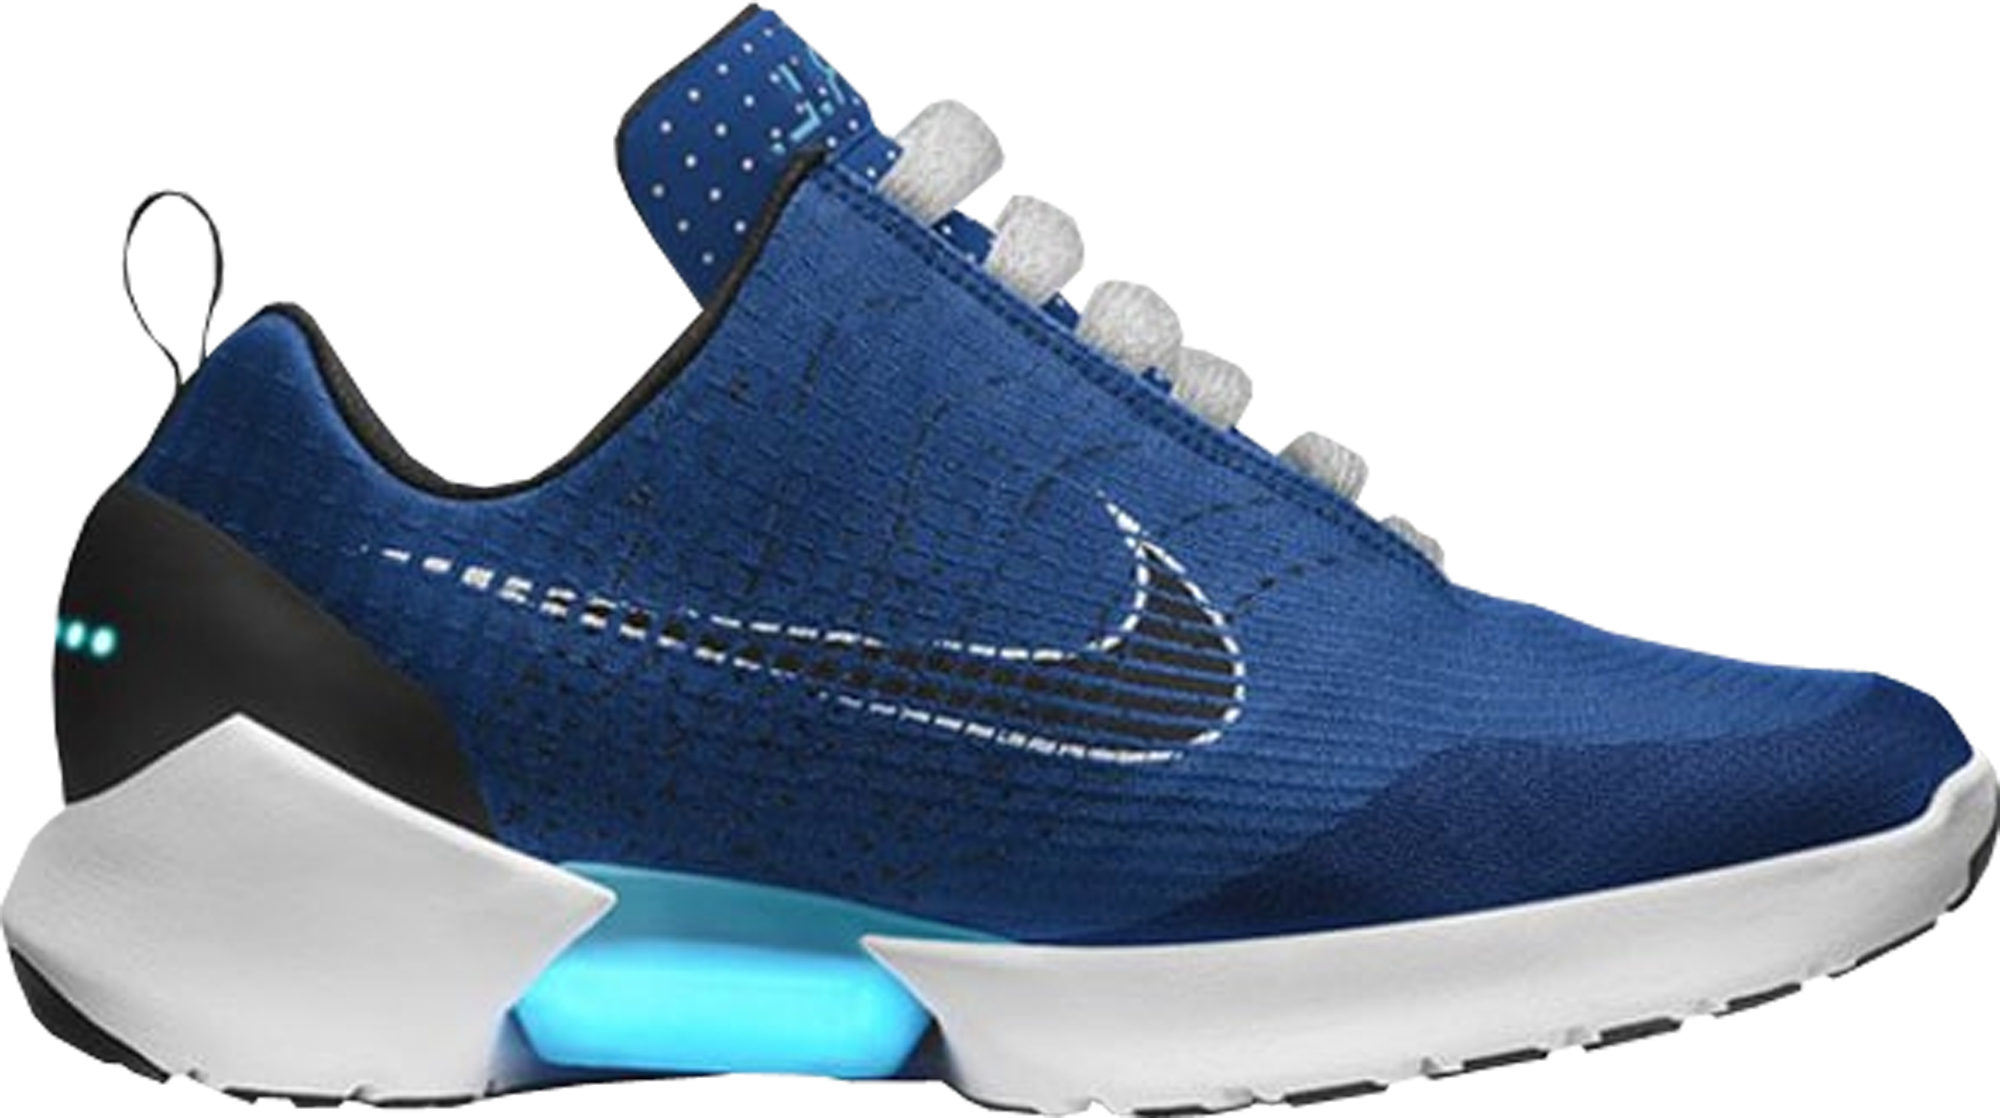 Nike HyperAdapt 1.0 Sport Royal Tinker Blue